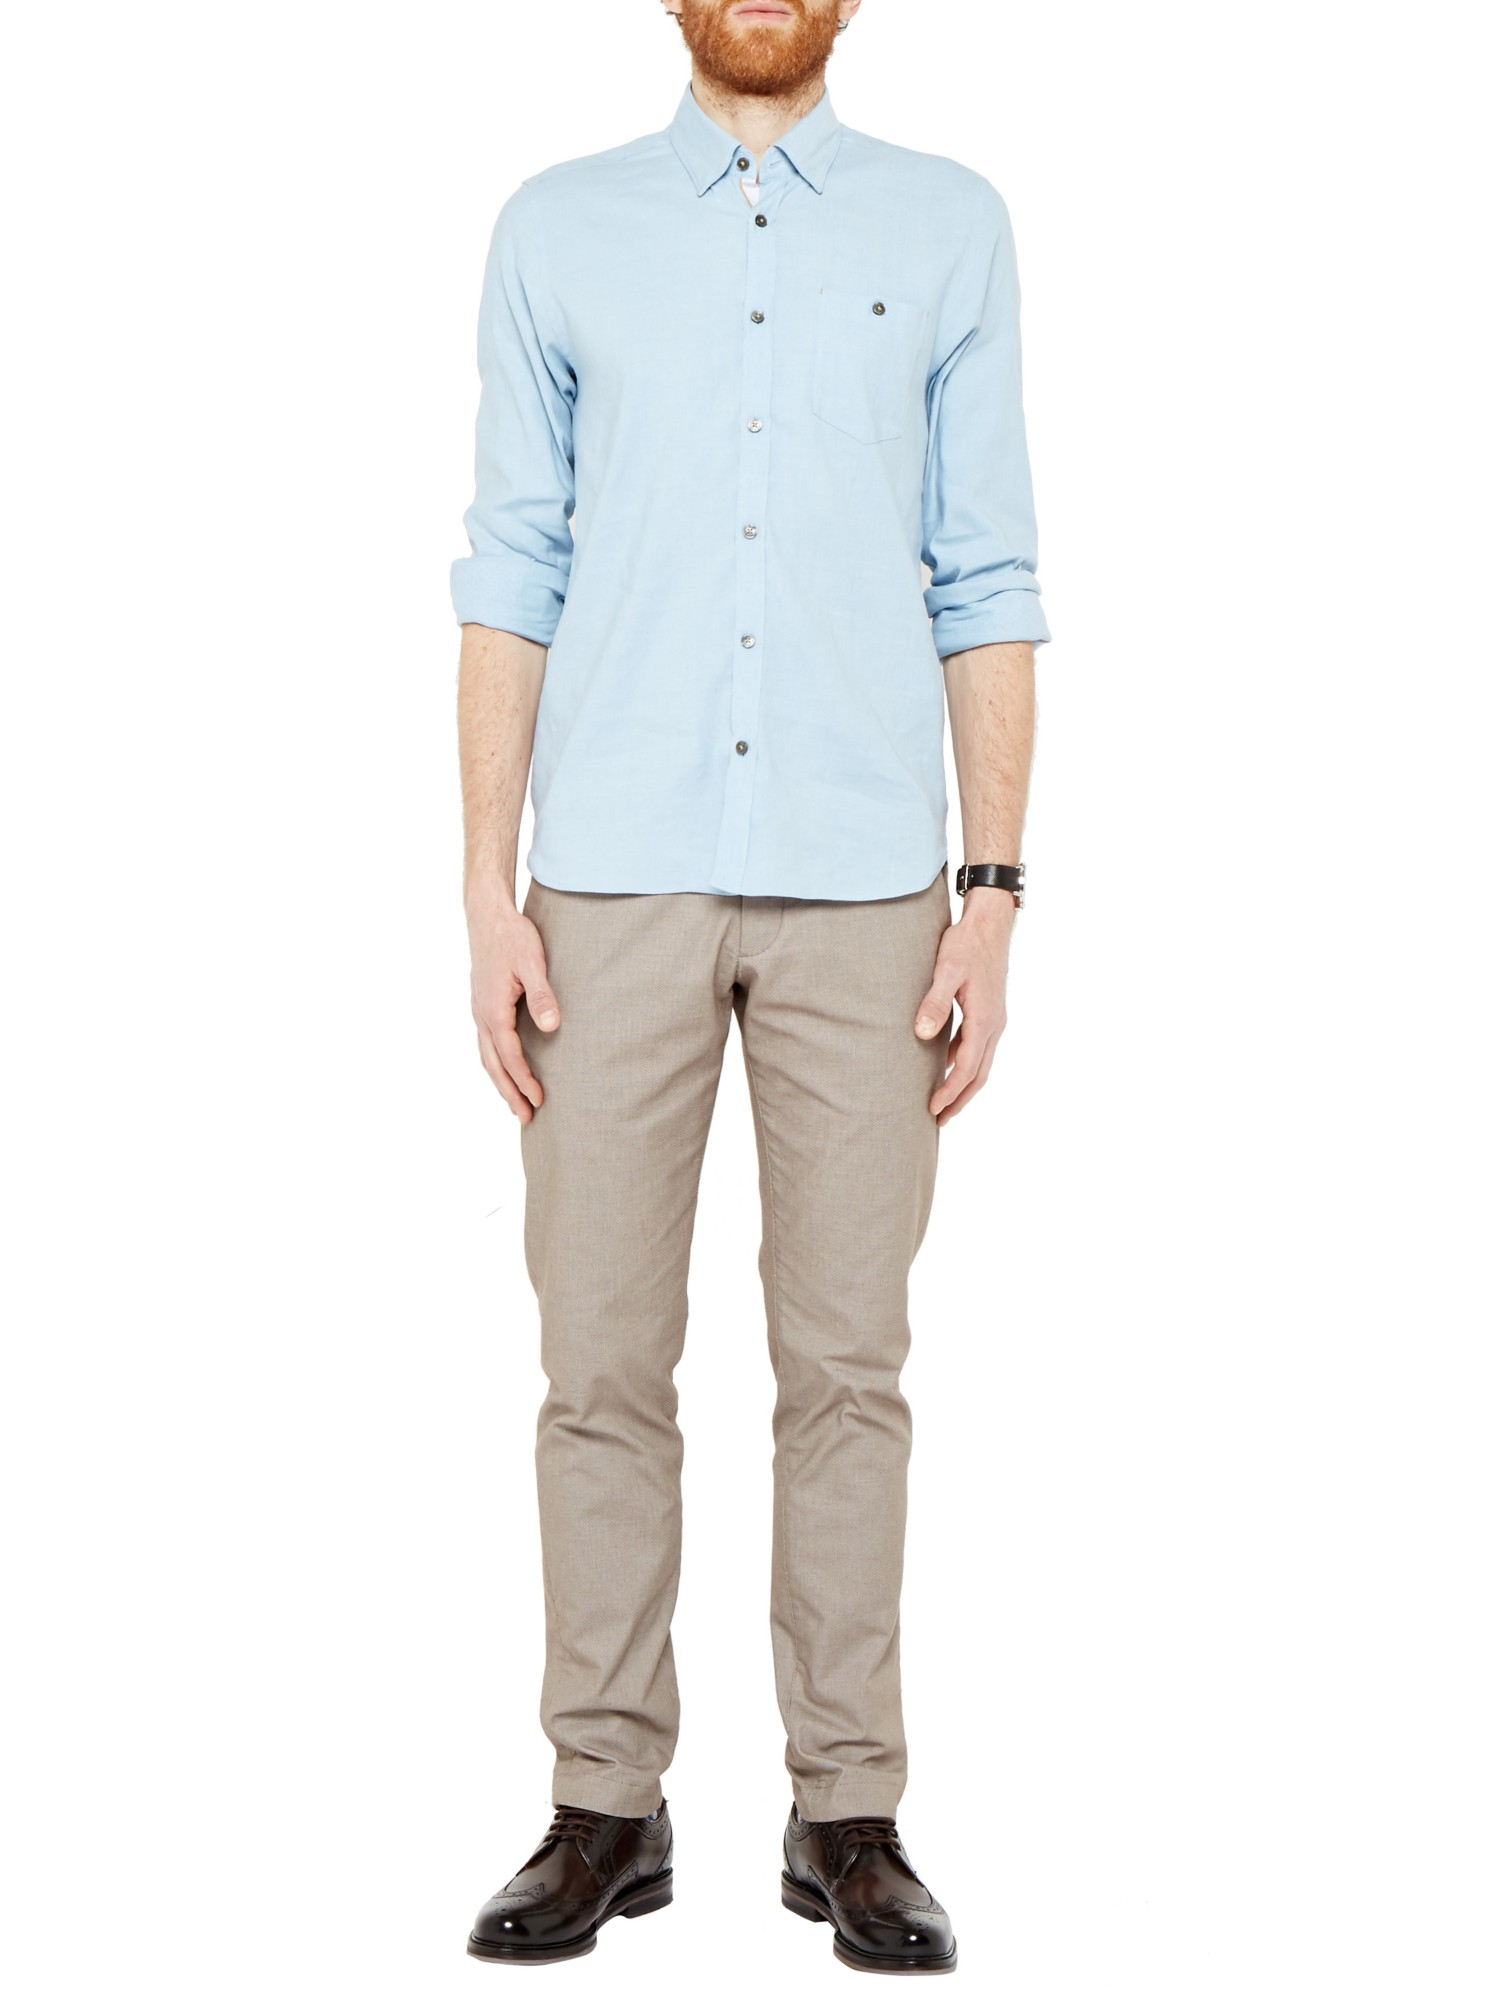 Ted Baker Newline Stretch Linen Blend Shirt in Light Blue (Blue) for Men